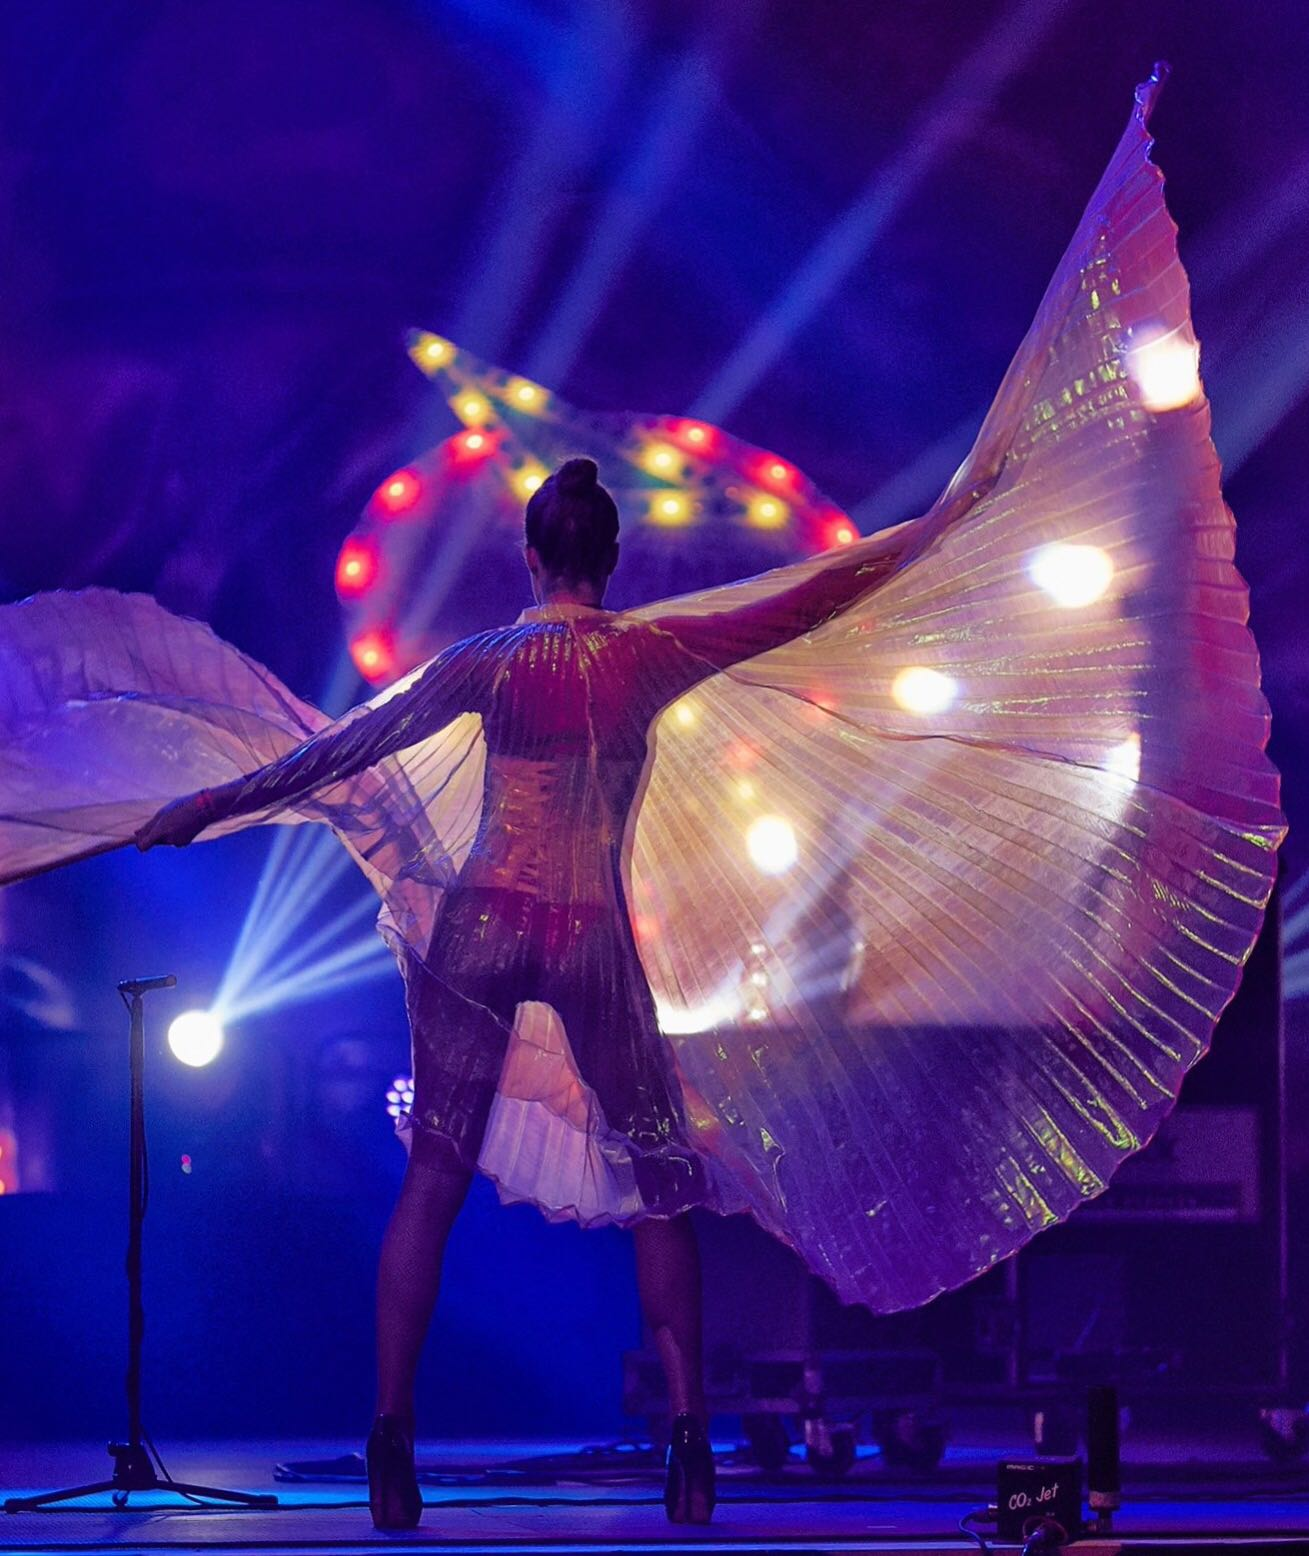 Black light danseres met vleugels